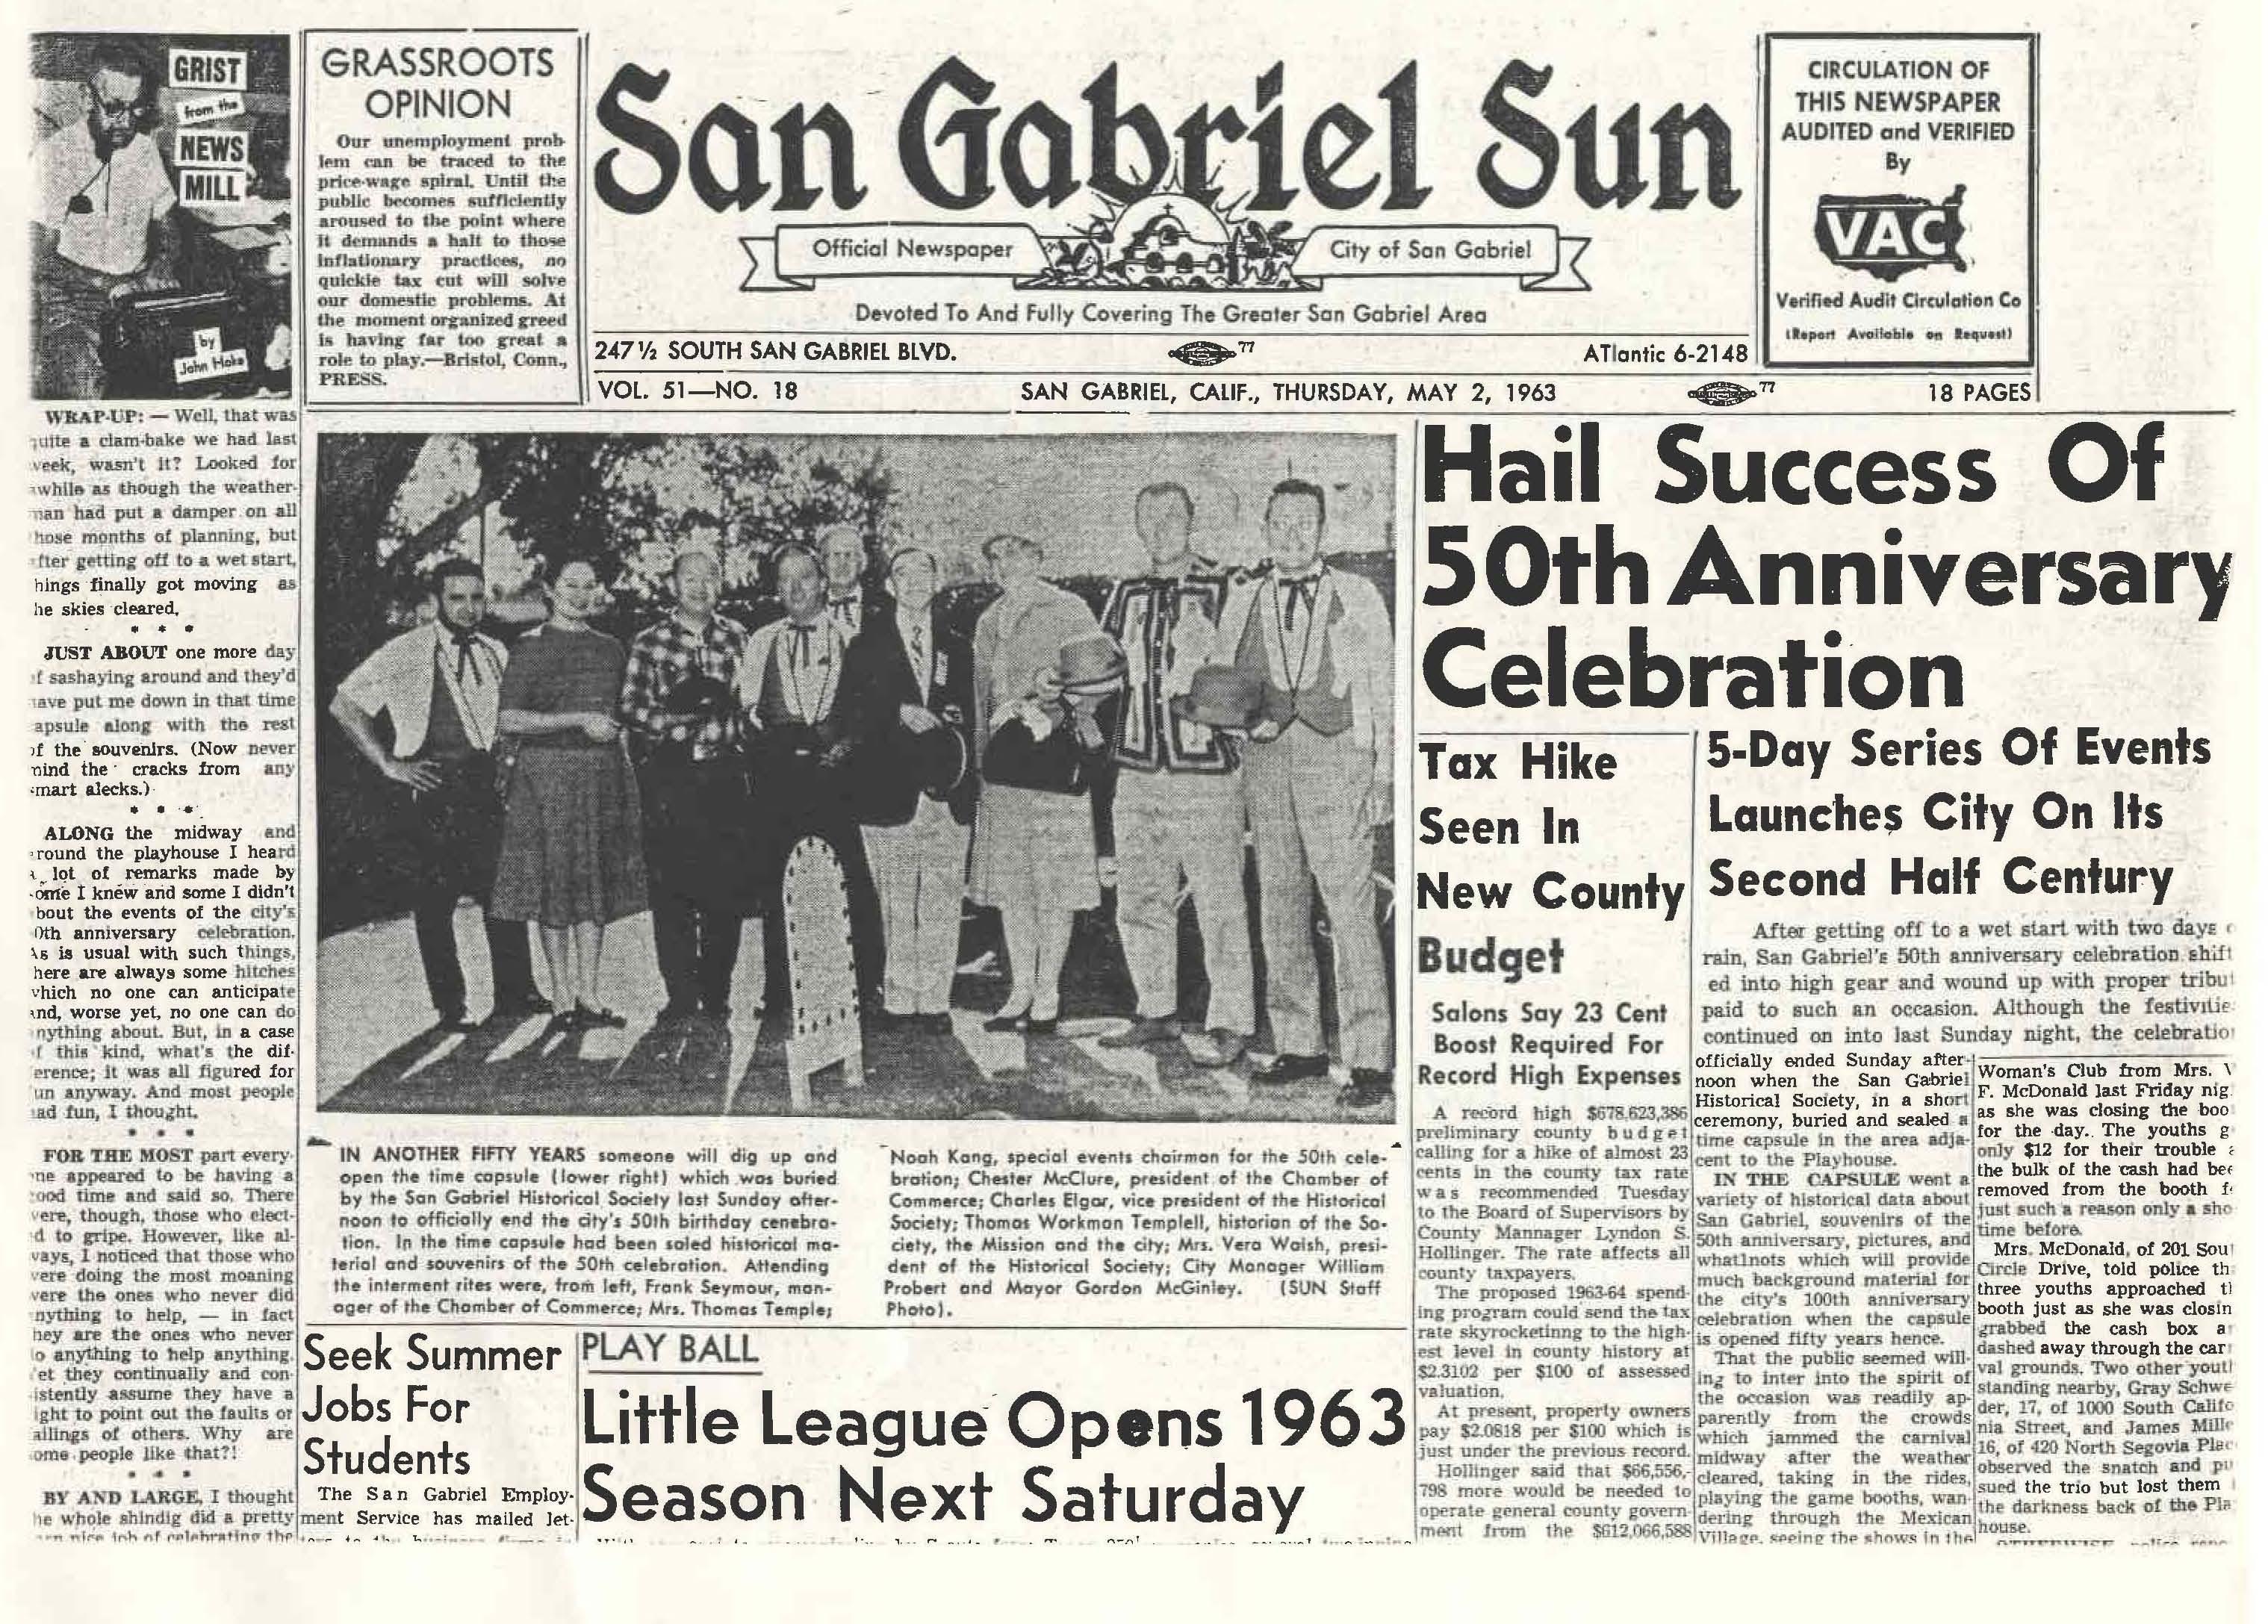 San Gabriel Sun 05 02 1963 cropped.jpg